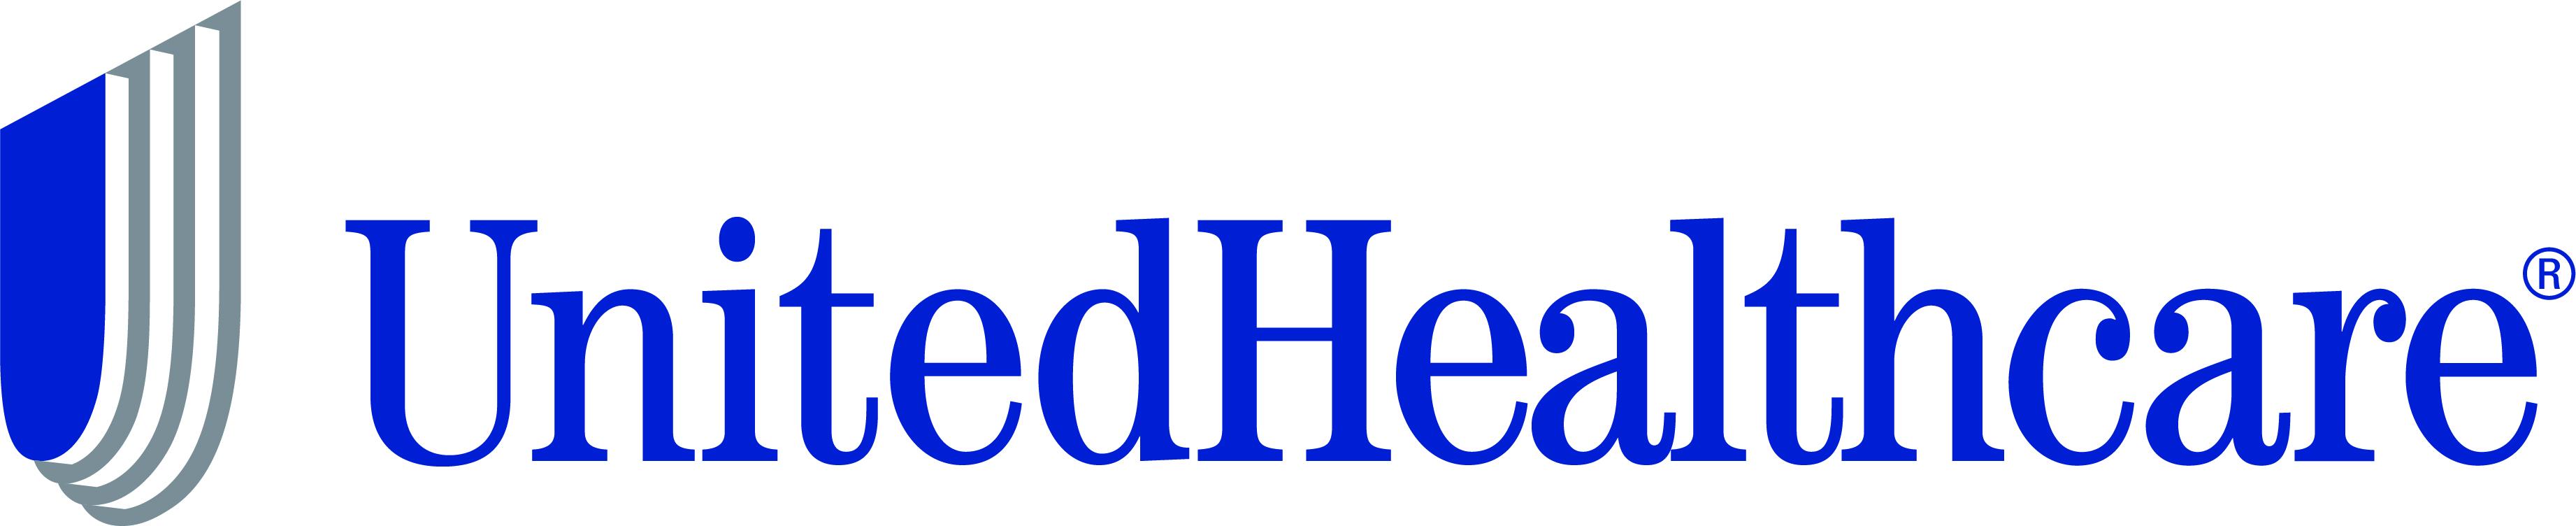 2015_UHC_Logo_4C